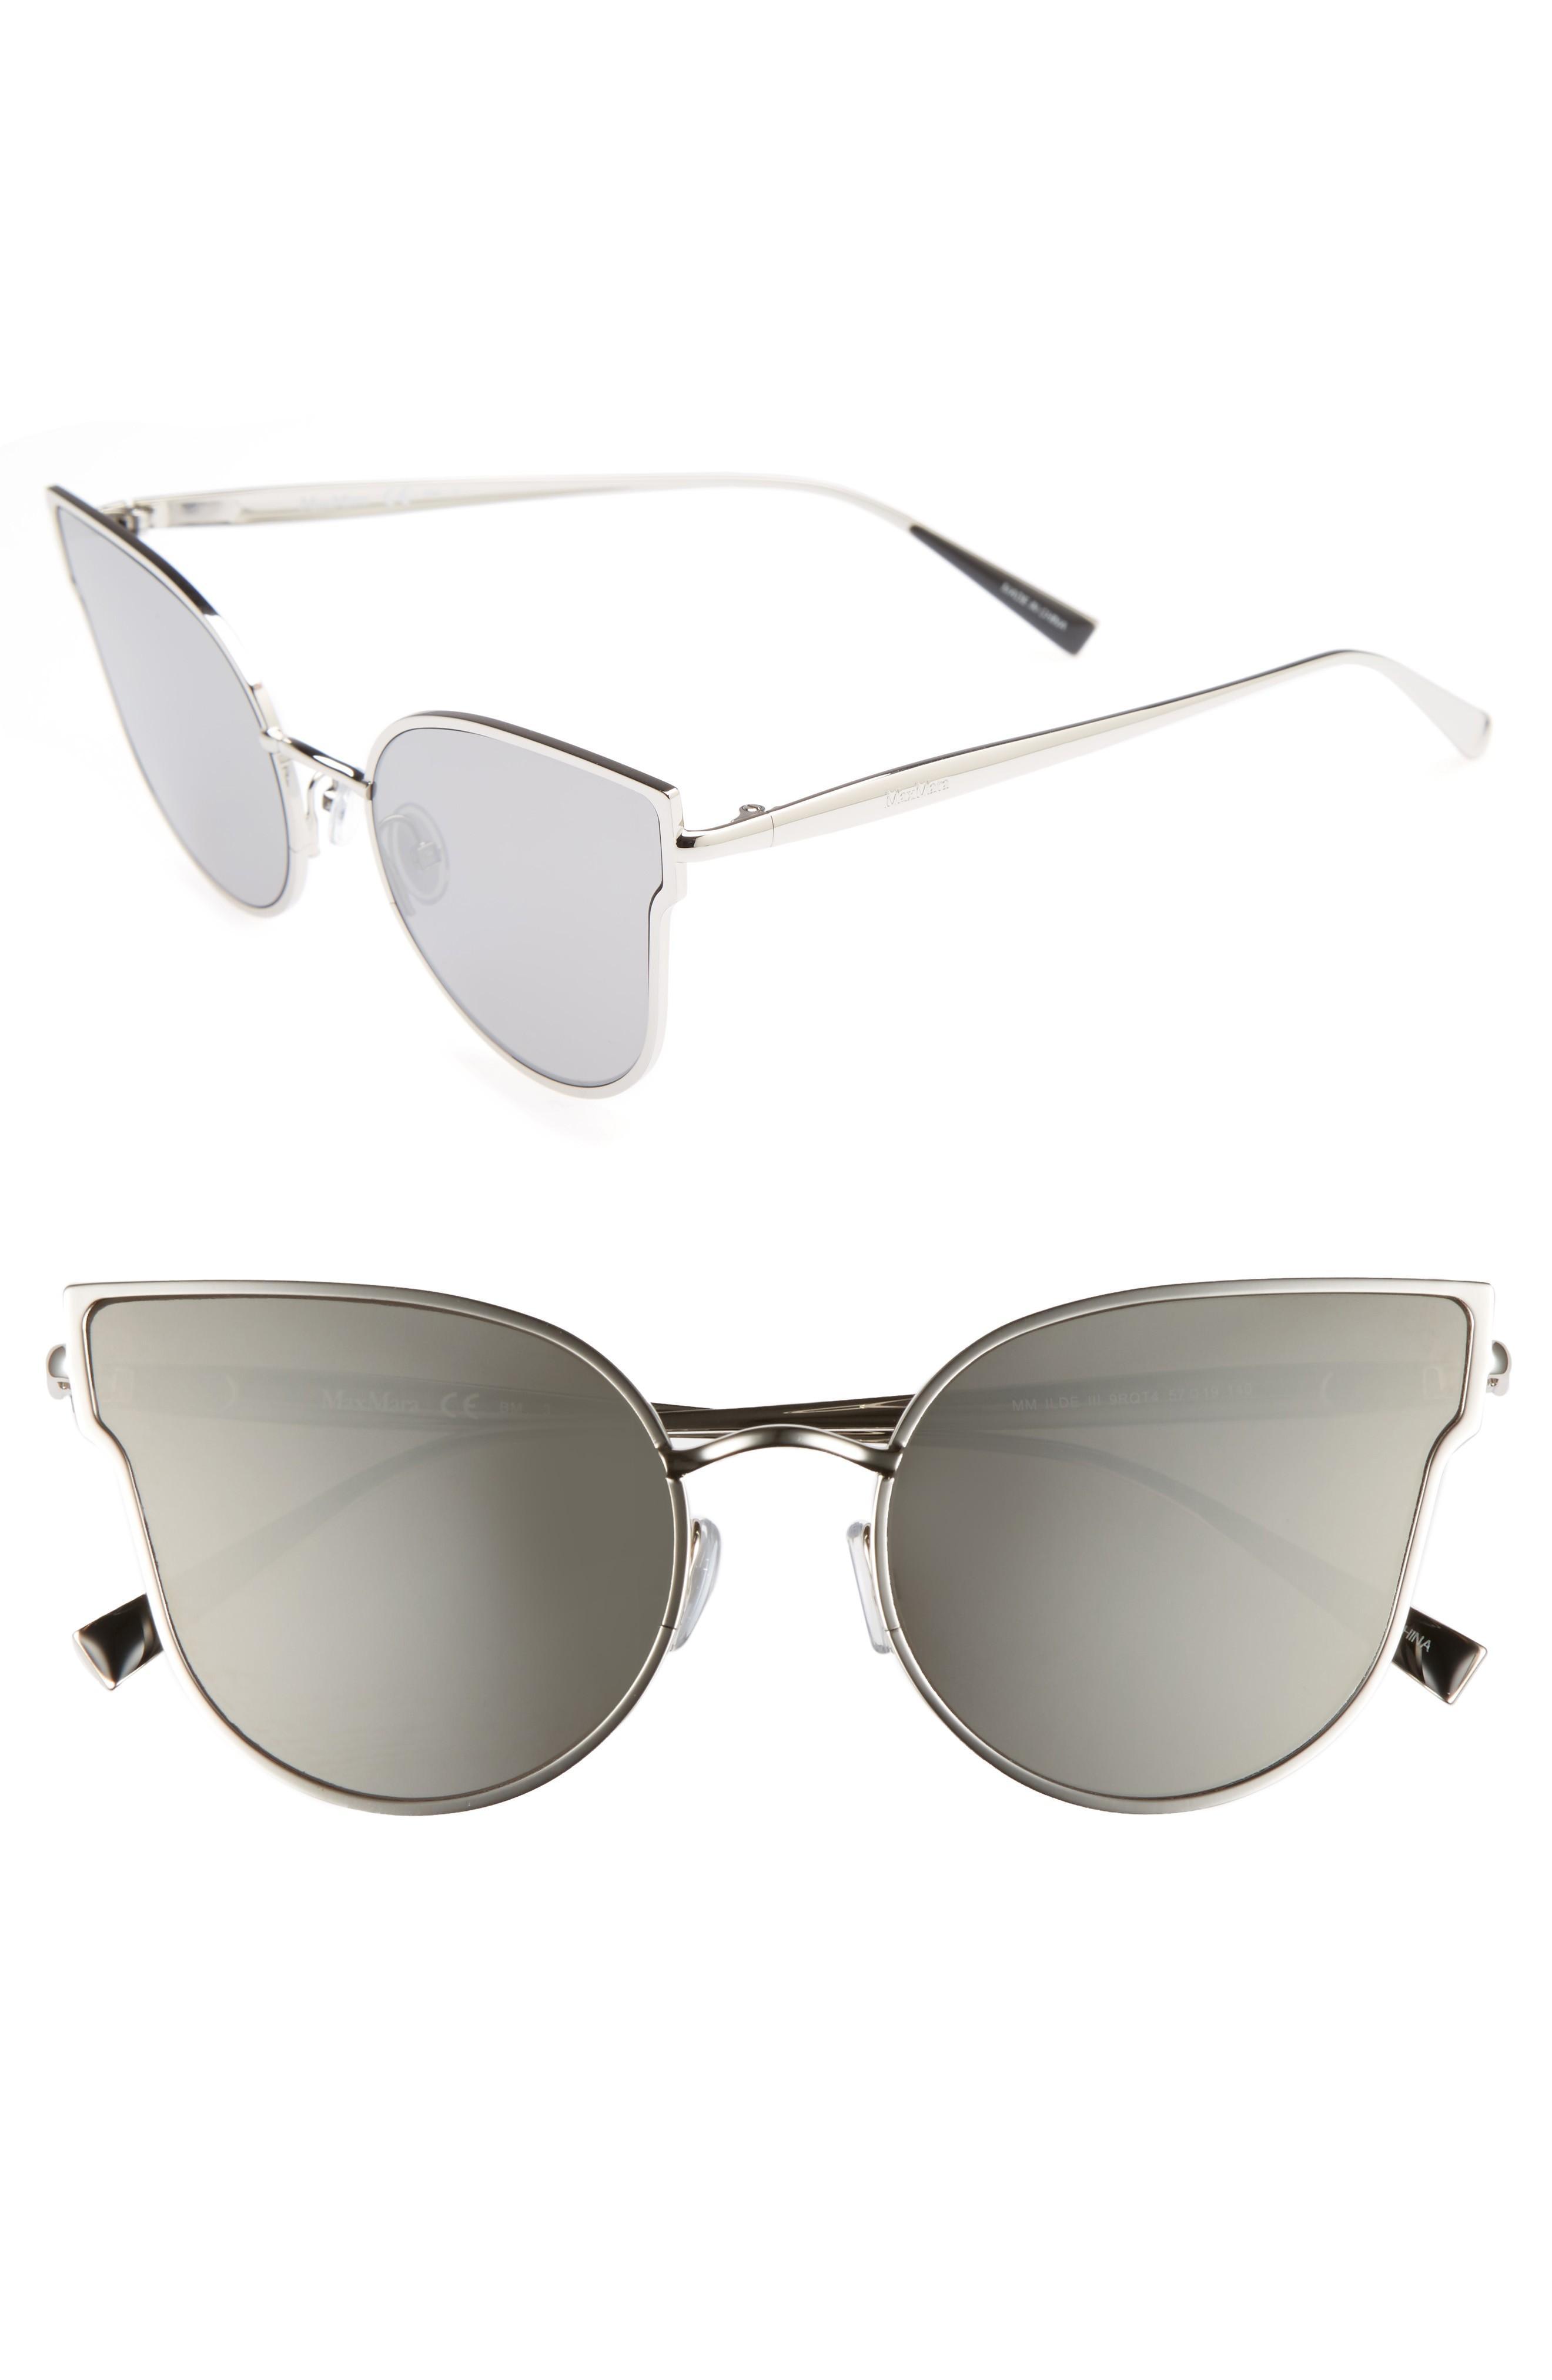 b9acbf2a751 Max Mara Ilde Iii 57Mm Mirrored Cat Eye Sunglasses - Smoke Silver ...